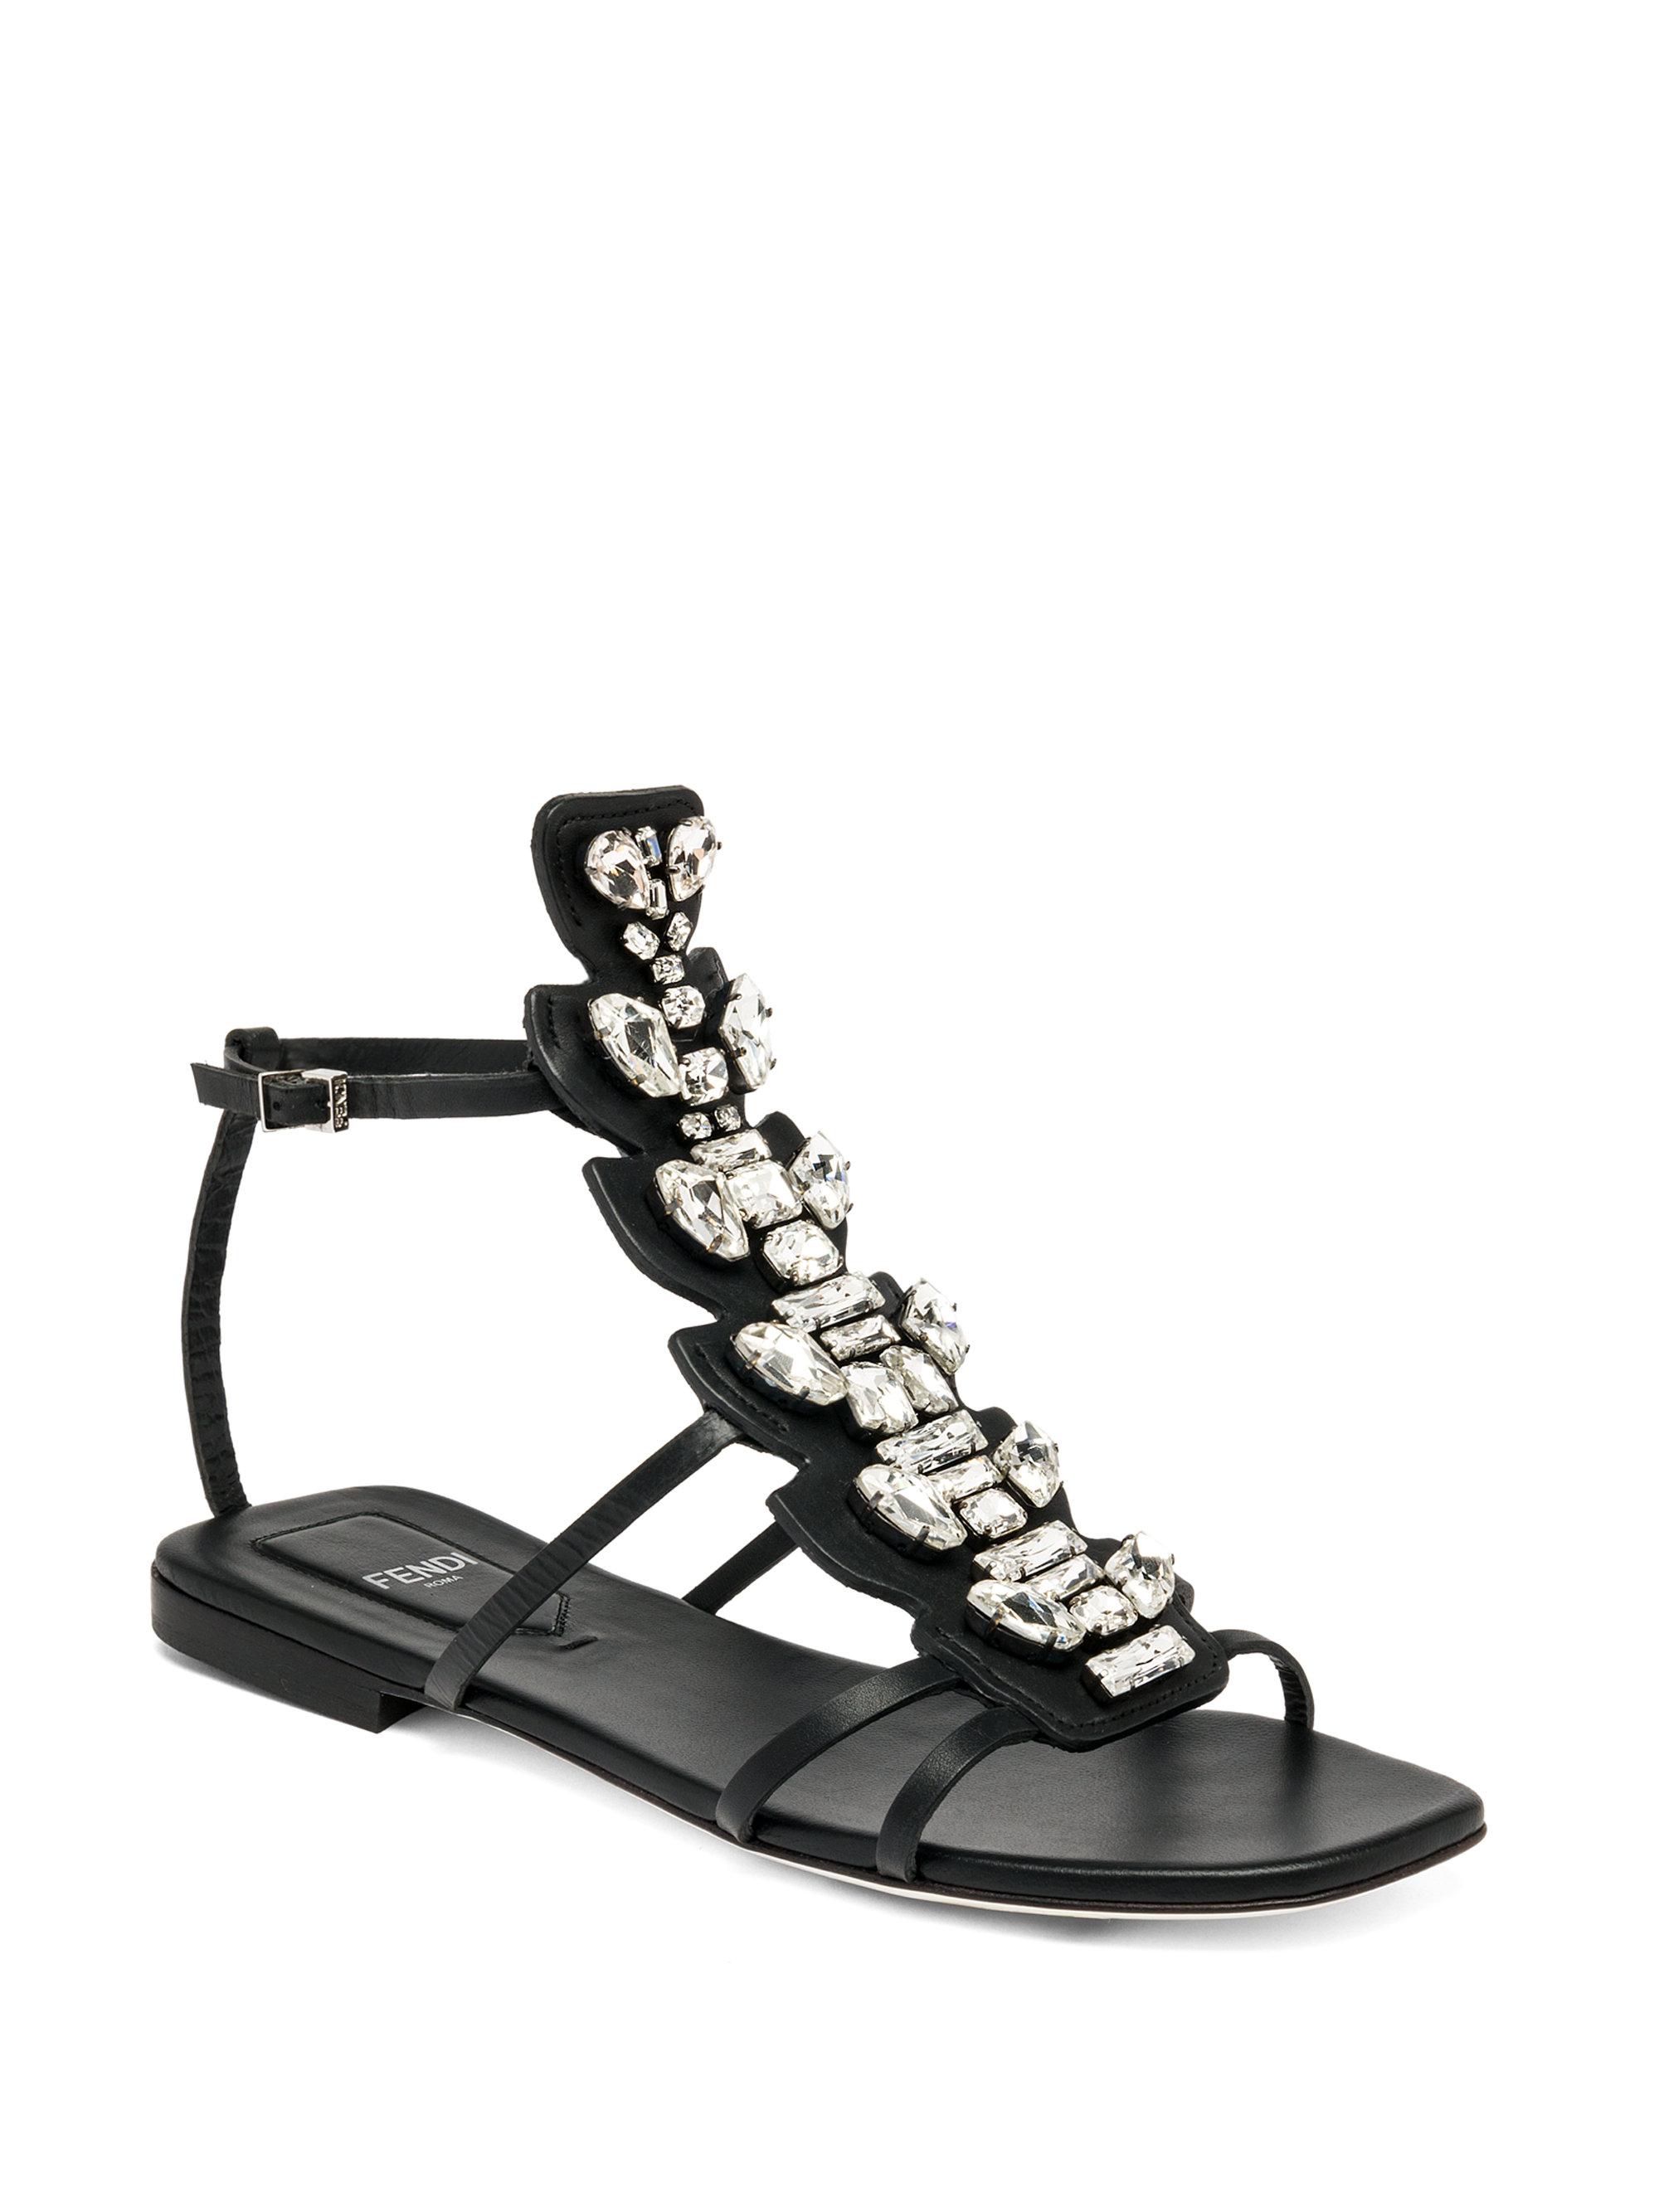 c1480c5df3b5 Lyst - Fendi Ava Crocodile   Leather Flat Sandals in Black